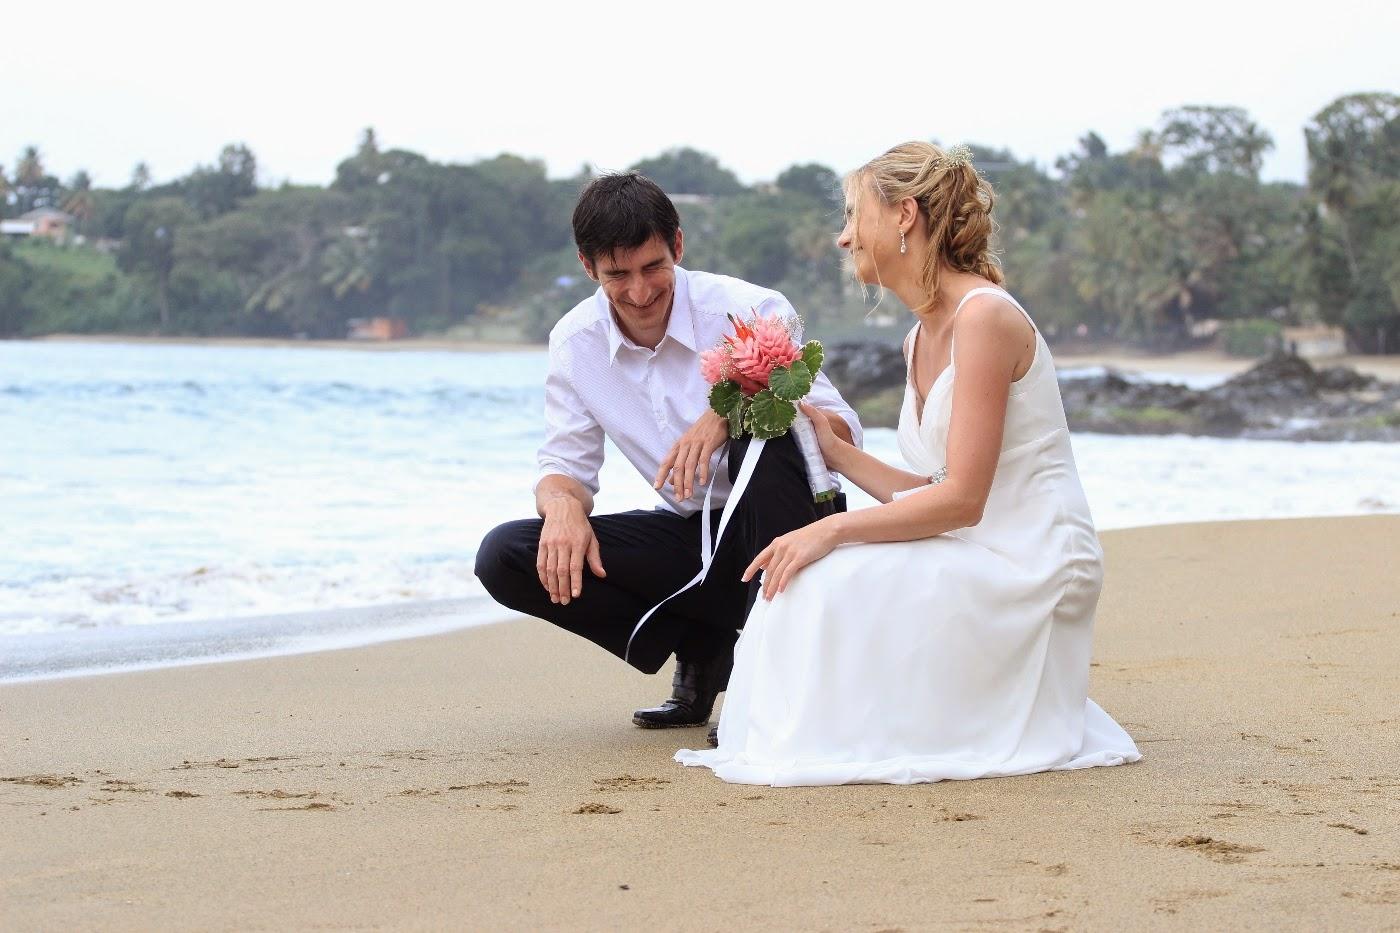 Real Destination Weddings: Family Beach Wedding In The Sun